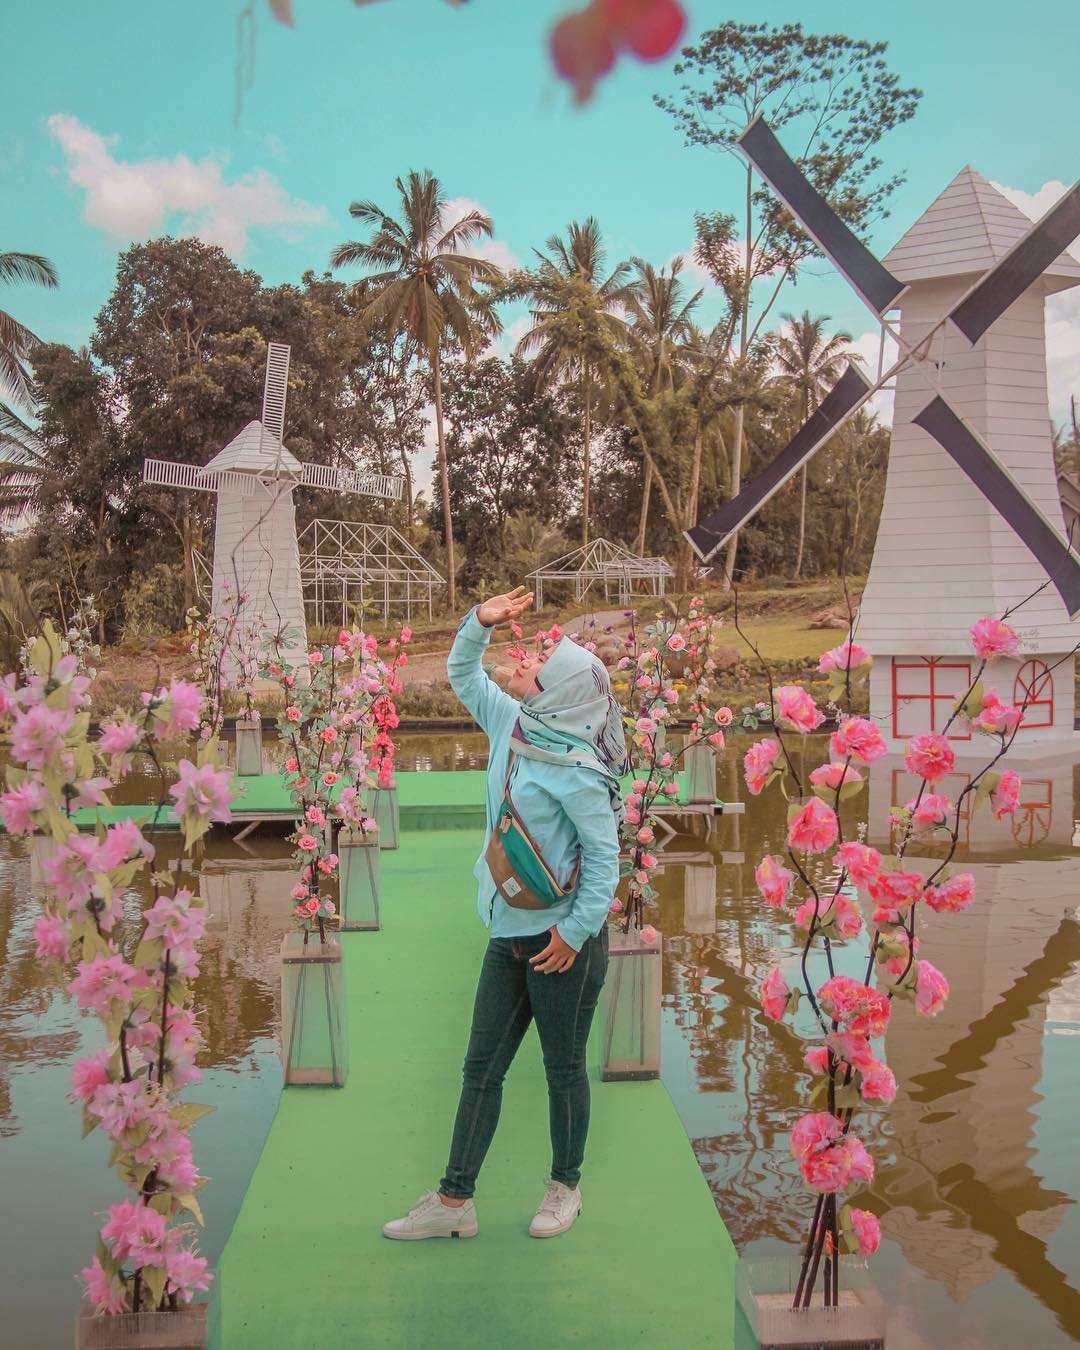 Berfoto di Jembatan Yang Ada di Alamanda Jogja Flower Garden, Image From @heidika